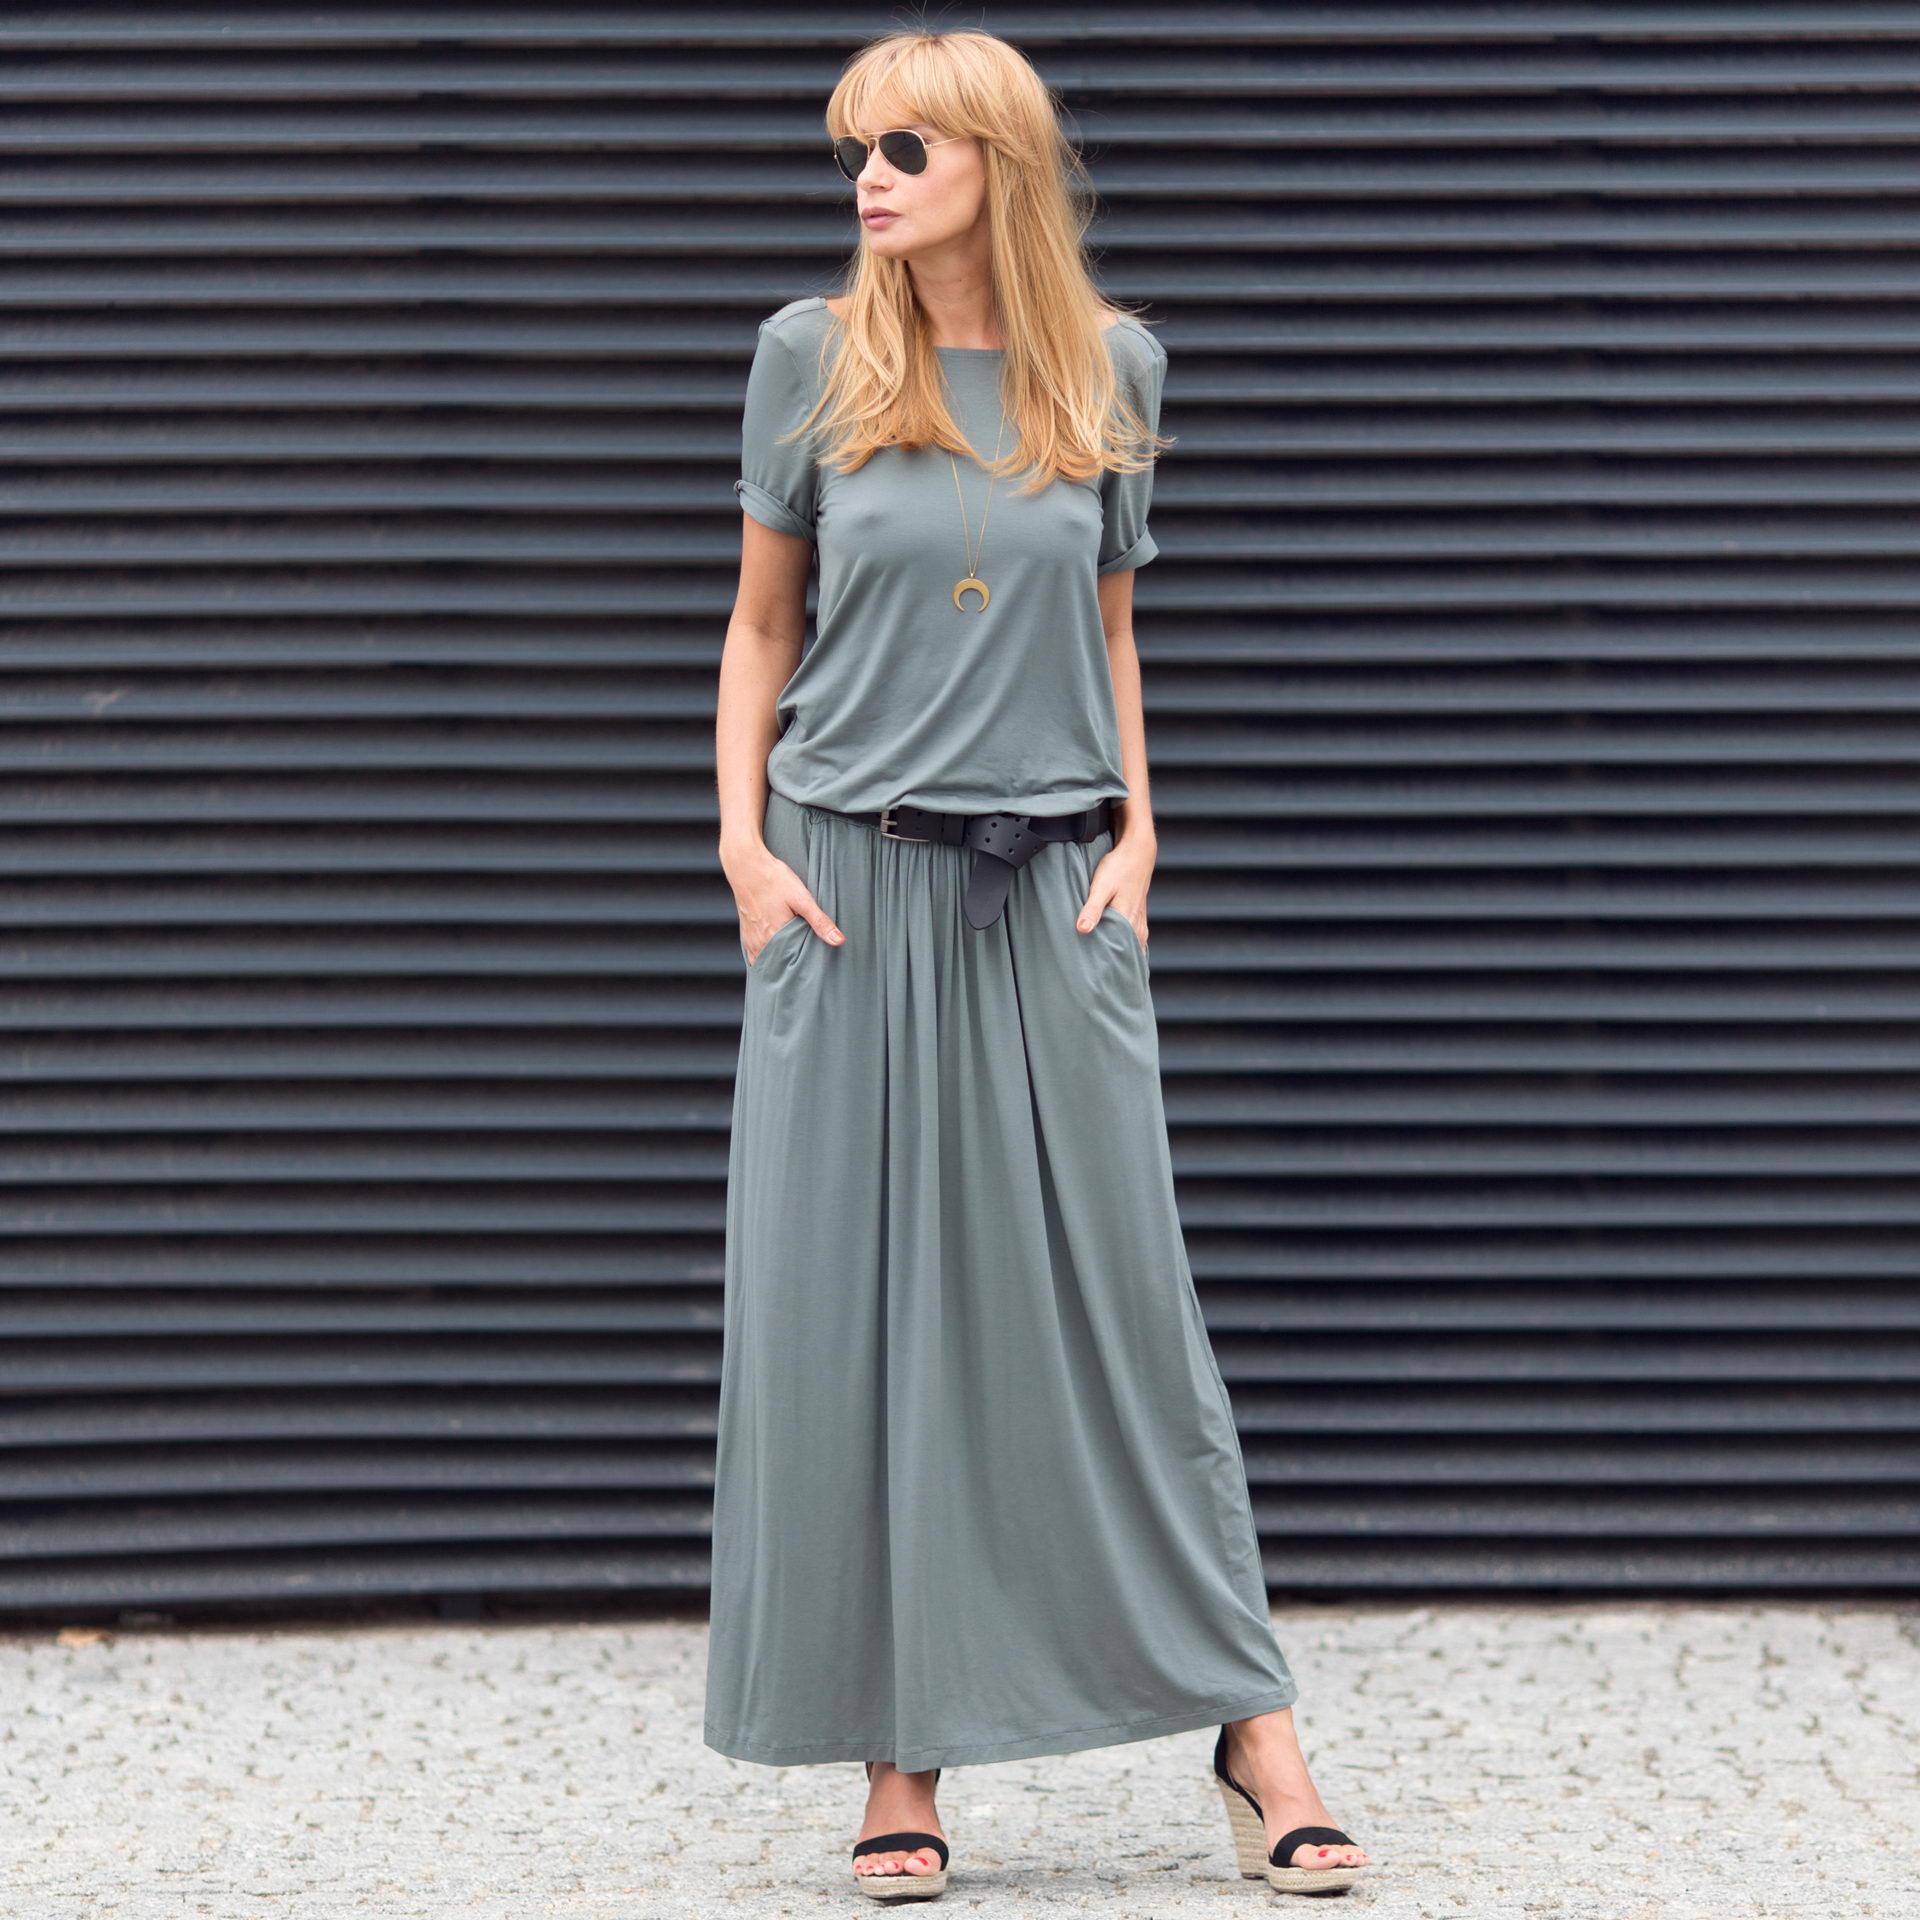 Sukienka Maxi Vera  niebieska sukienka odkryte plecy polski projektant- Candy Floss